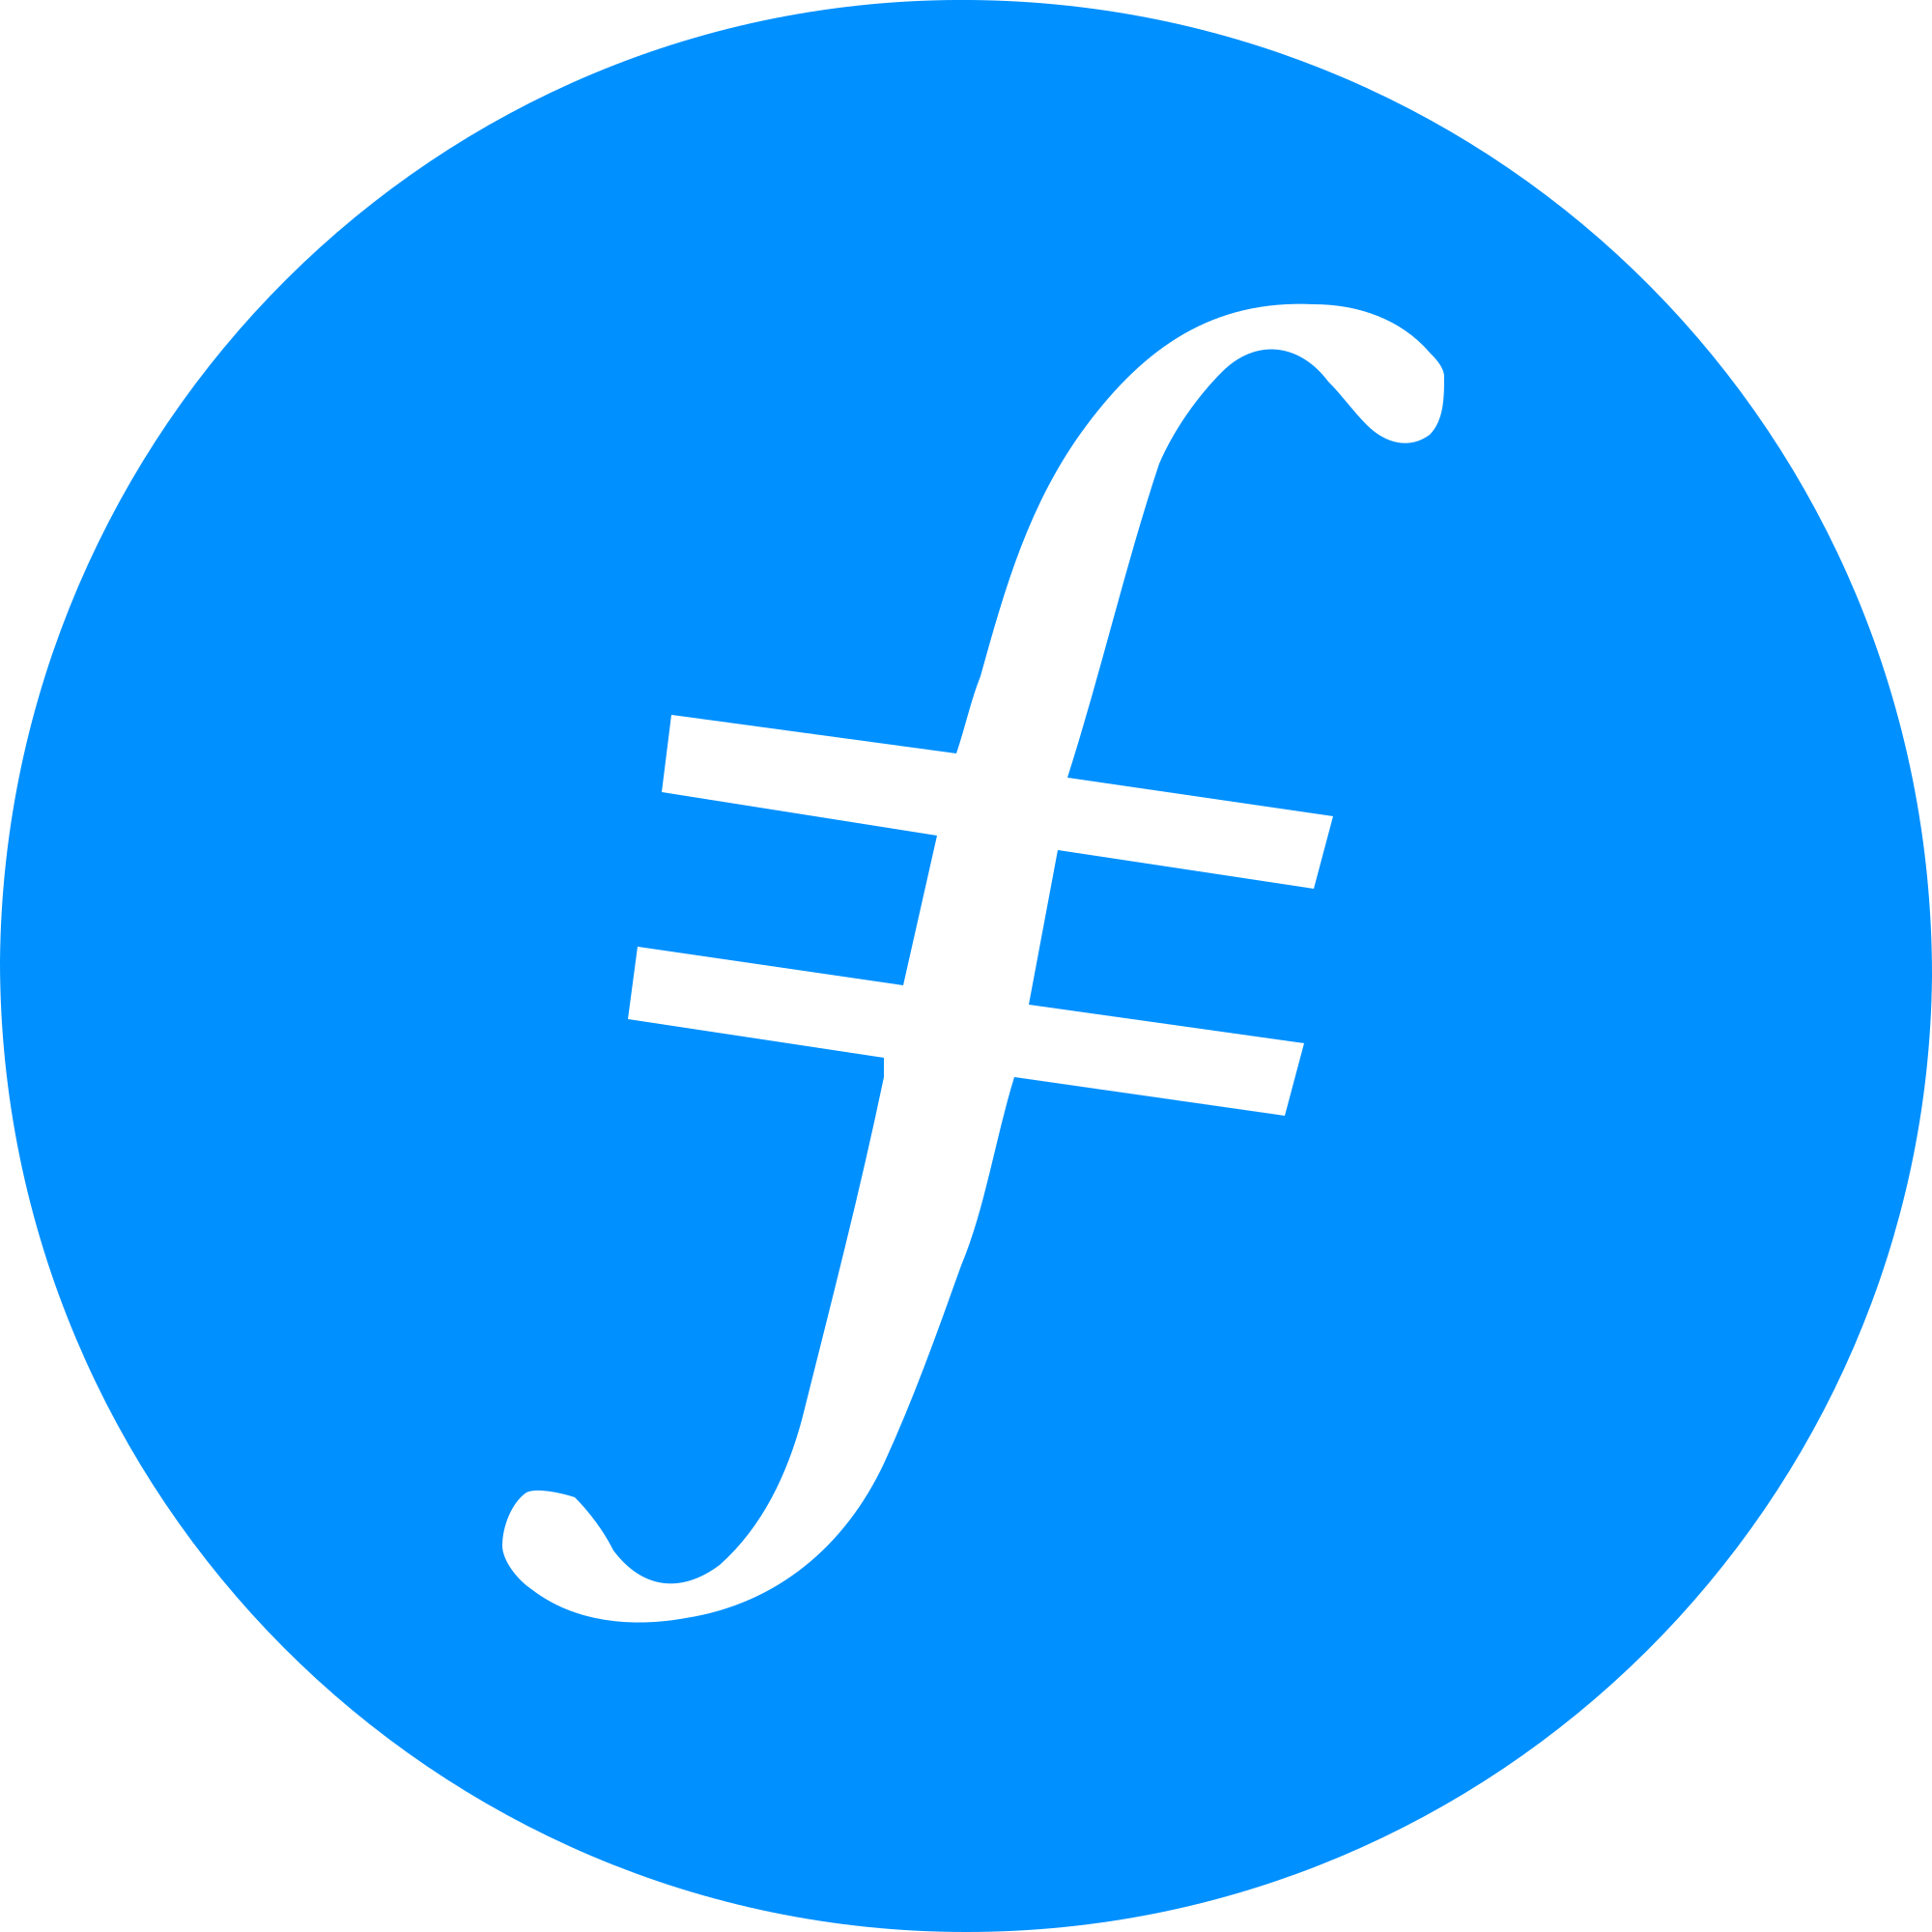 تصویر فایل کوین ا filecoin فایل کوین filecoin فایل کوین